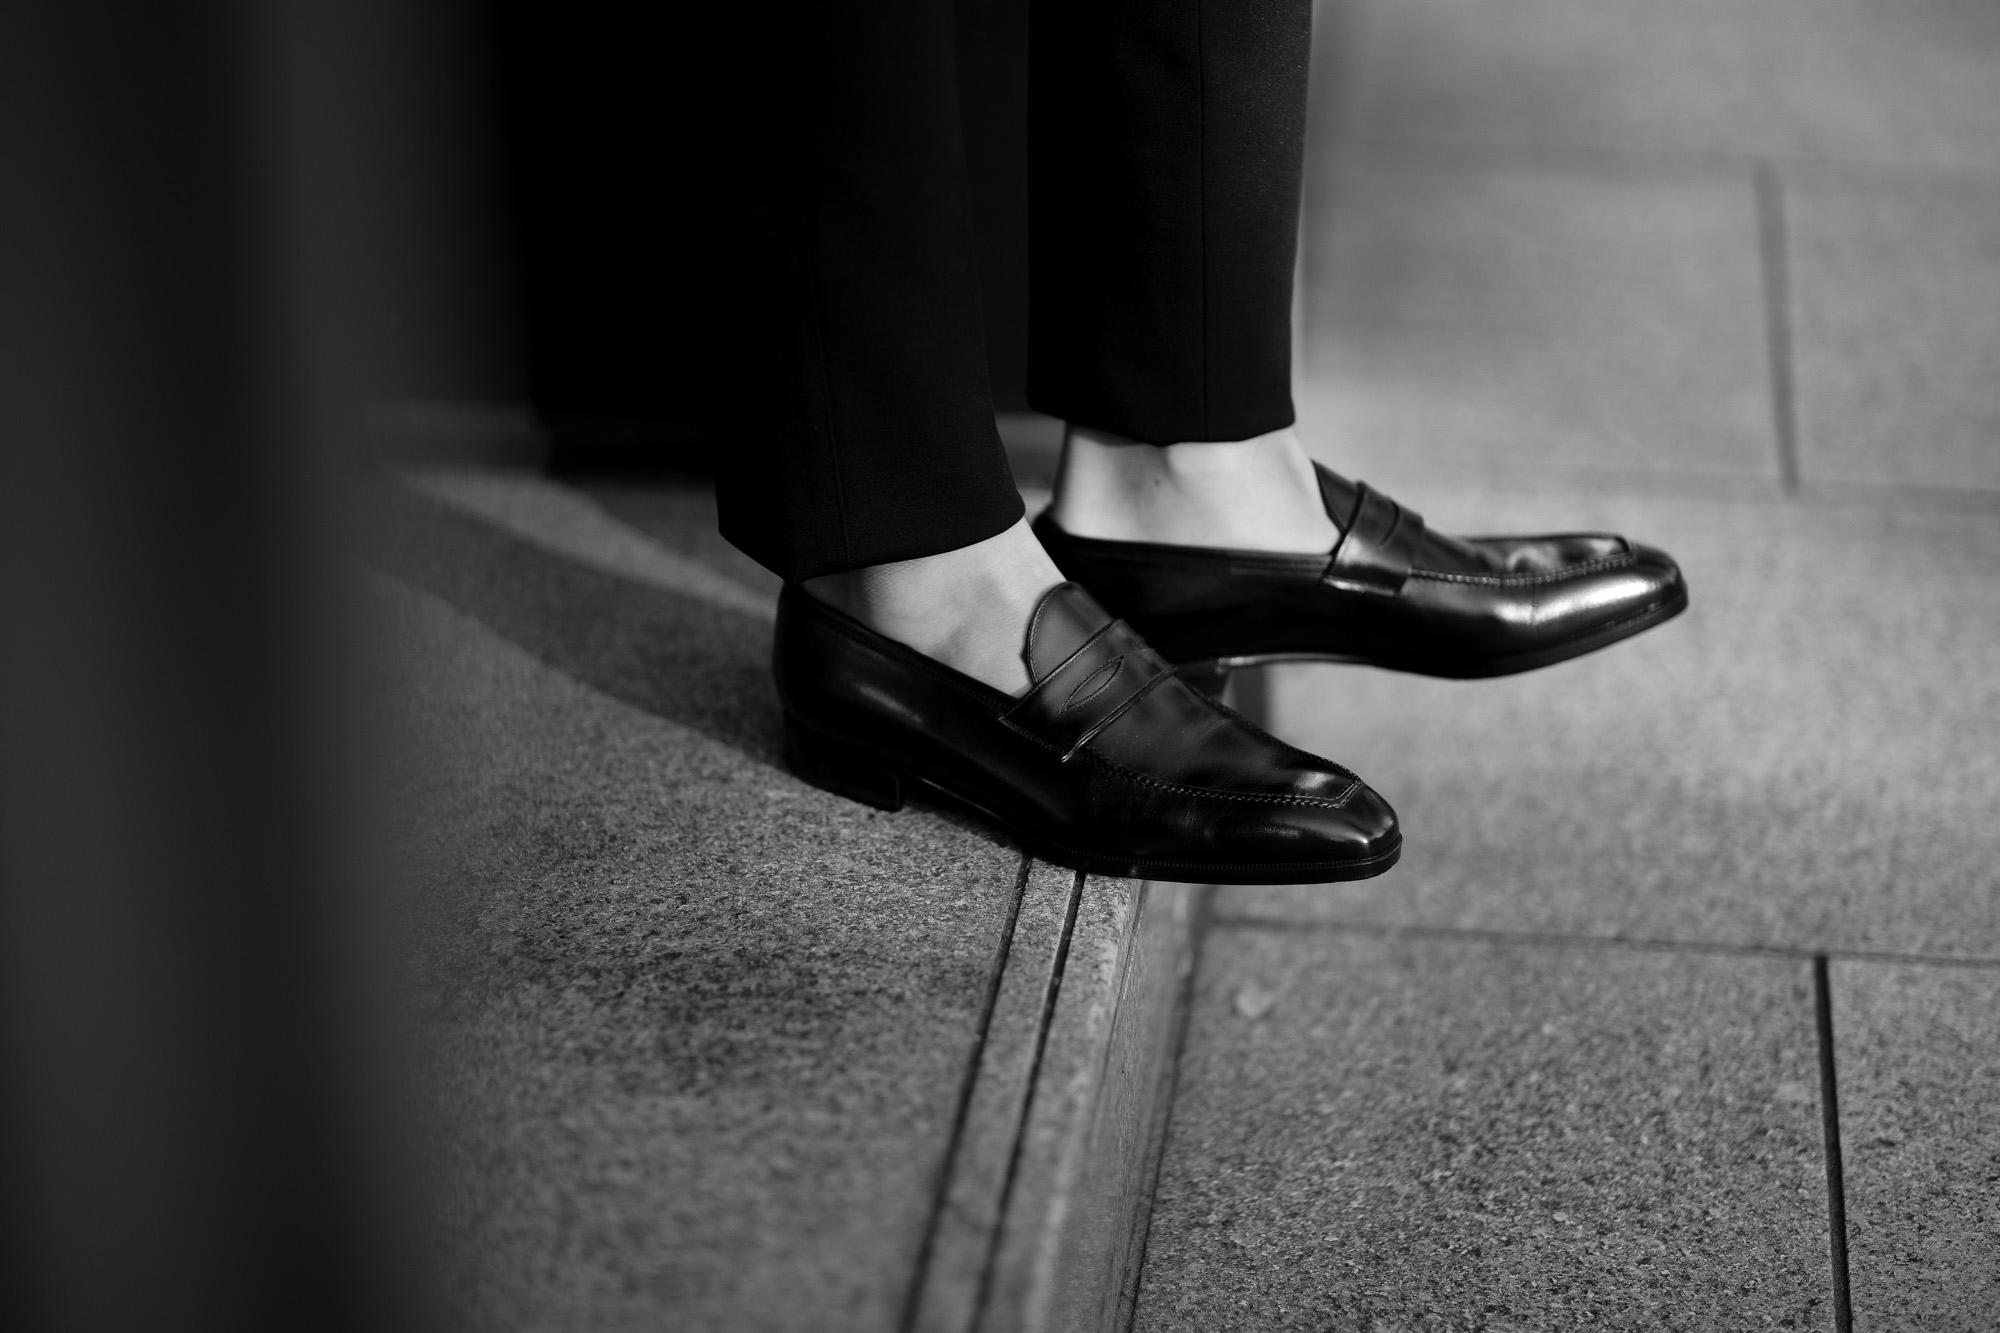 AUBERCY (オーベルシー) LUPIN 3565 Coin Loafer (ルパン) Du Puy Vitello デュプイ社ボックスカーフ ドレスシューズ ローファー NERO (ブラック) made in italy (イタリア製) 2020 秋冬新作 オーベルシー ルパン ヴィッテロレザー カーフレザー コインローファー ブラック ローファー ドレスシューズ 日本代理店 愛知 名古屋 altoediritto アルトエデリット